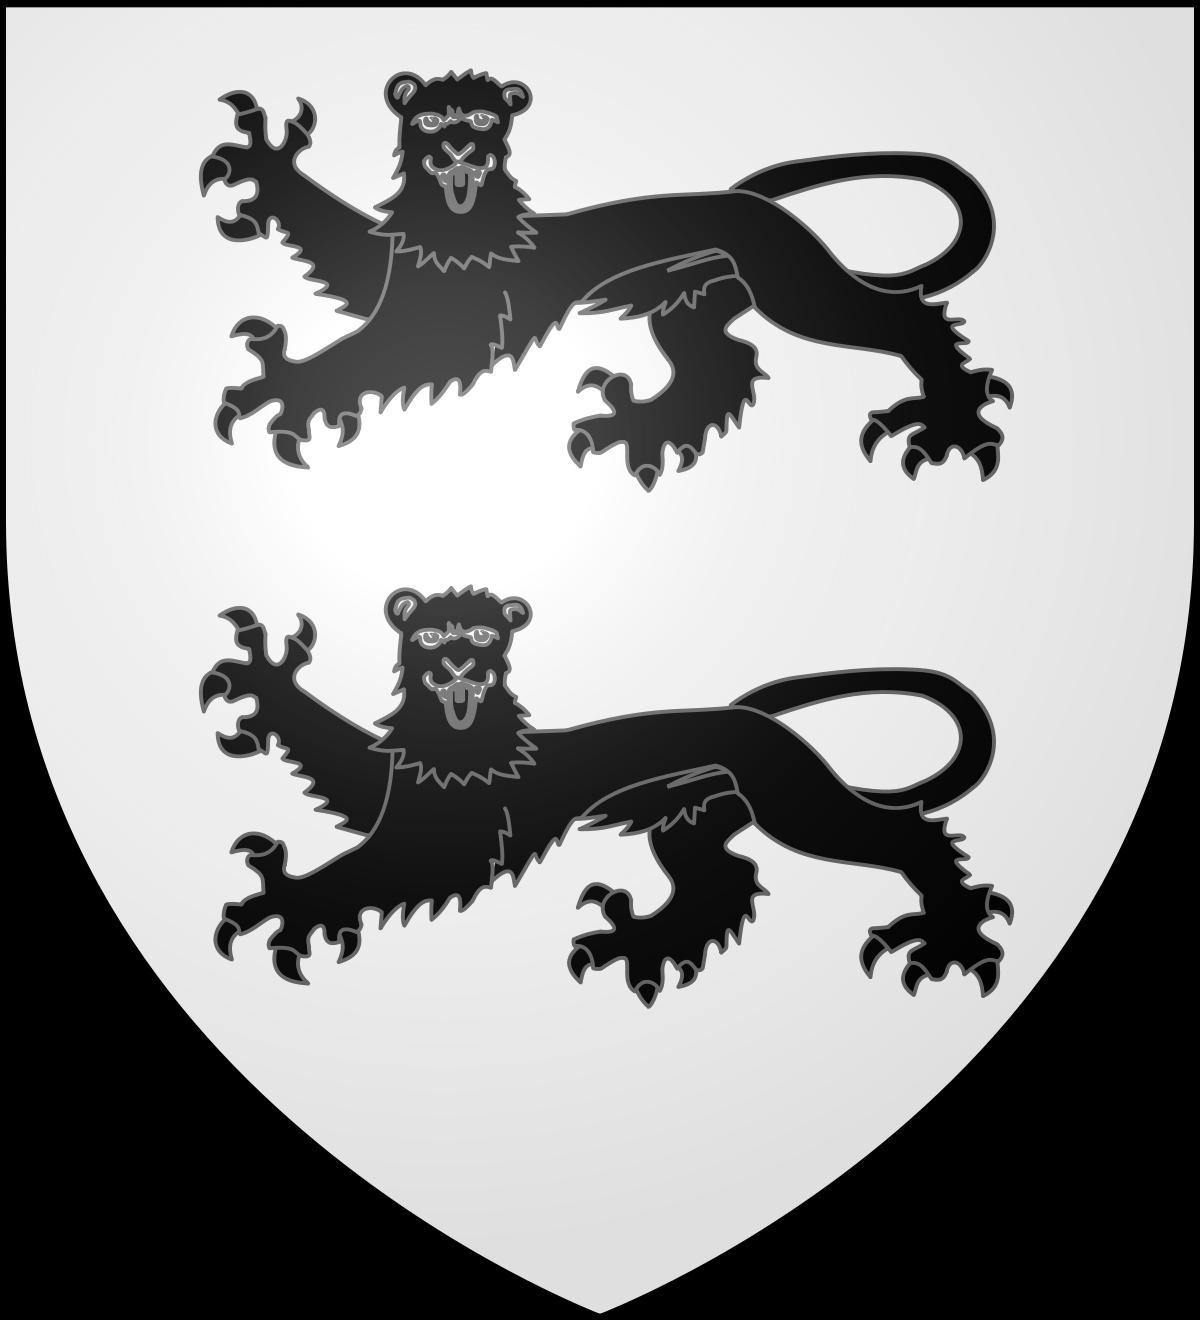 Leopard heraldry wikipedia . Musician clipart medieval